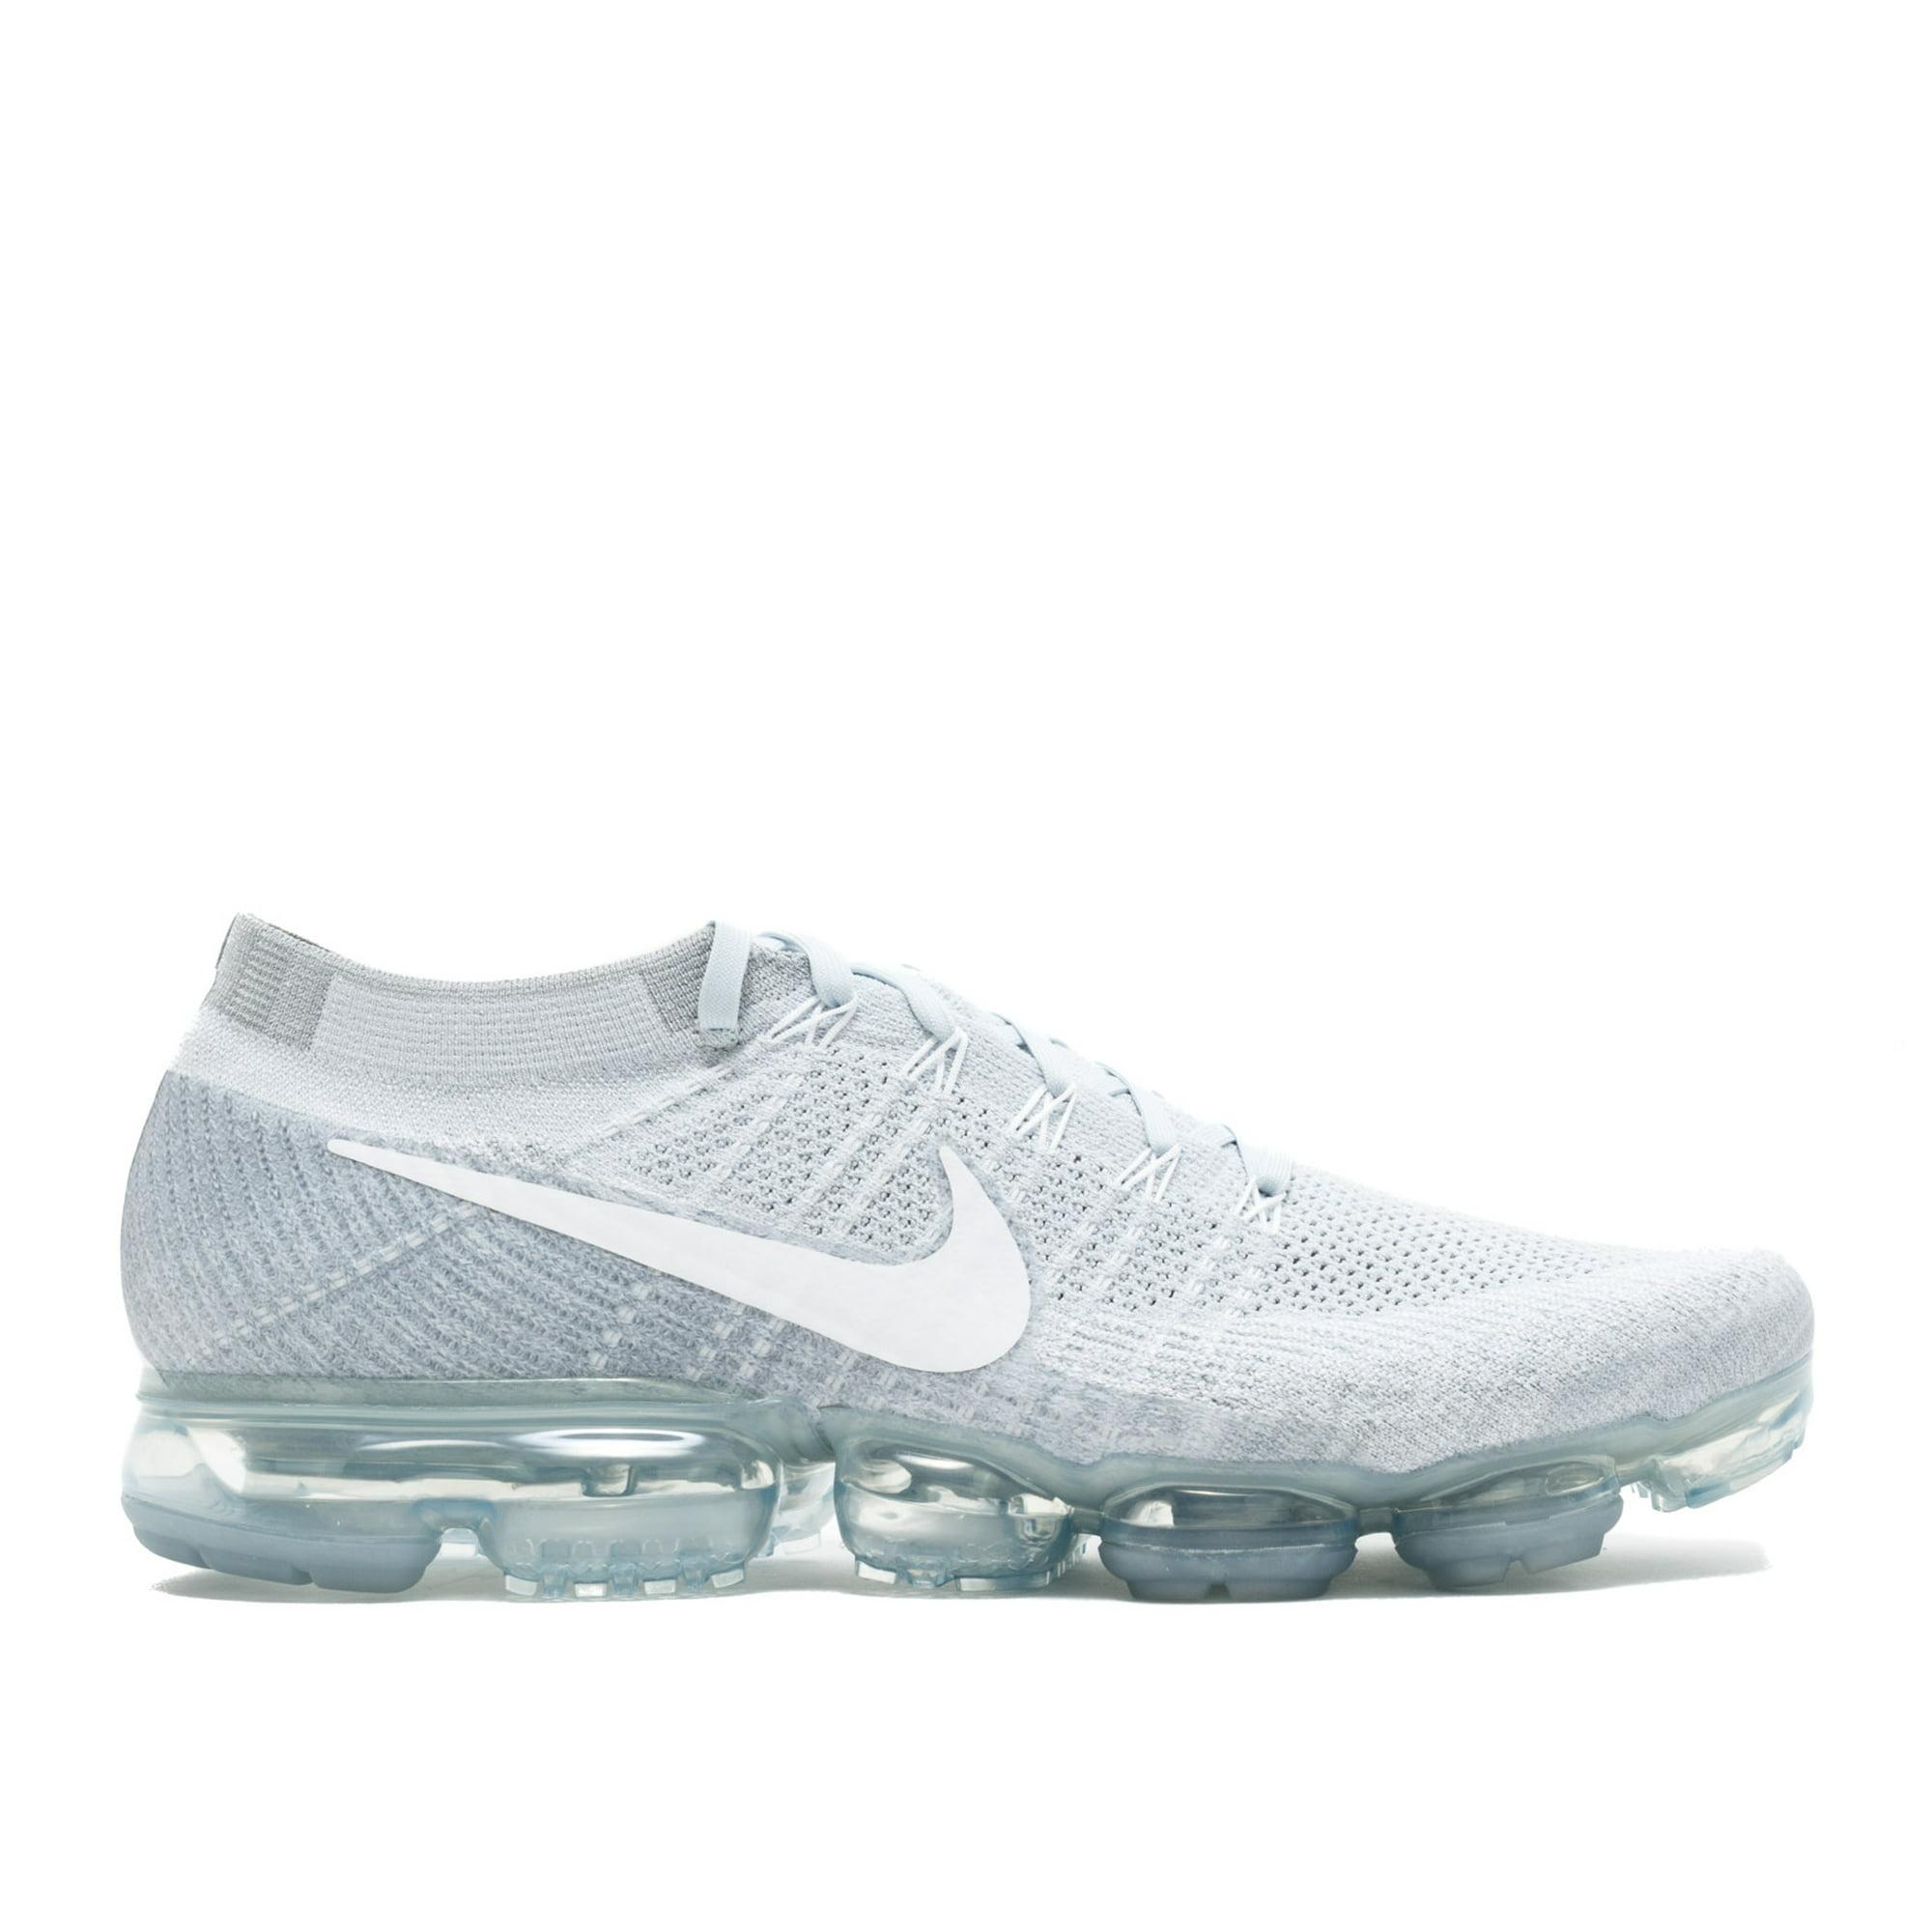 77ff366d2c6 Nike - Men - Nike Air Vapormax Flyknit  Pure Platinum  - 849558-004 - Size  11.5